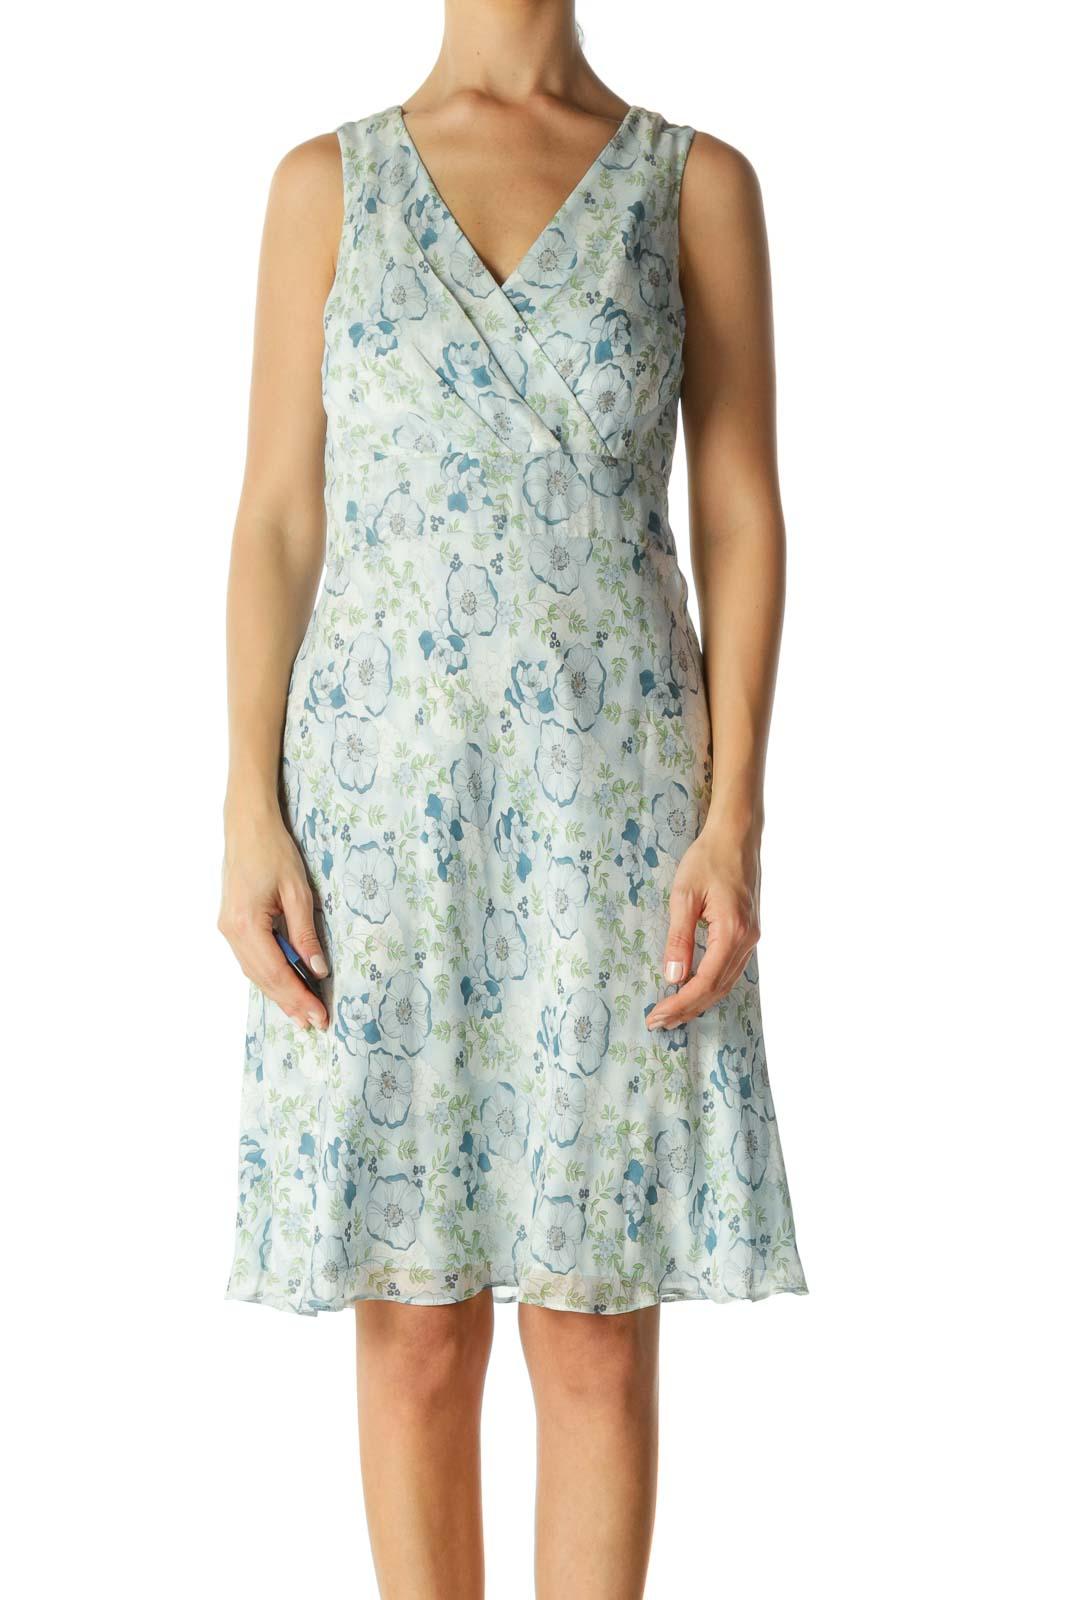 Blue Green White Silk Floral Print Surplice Day Dress